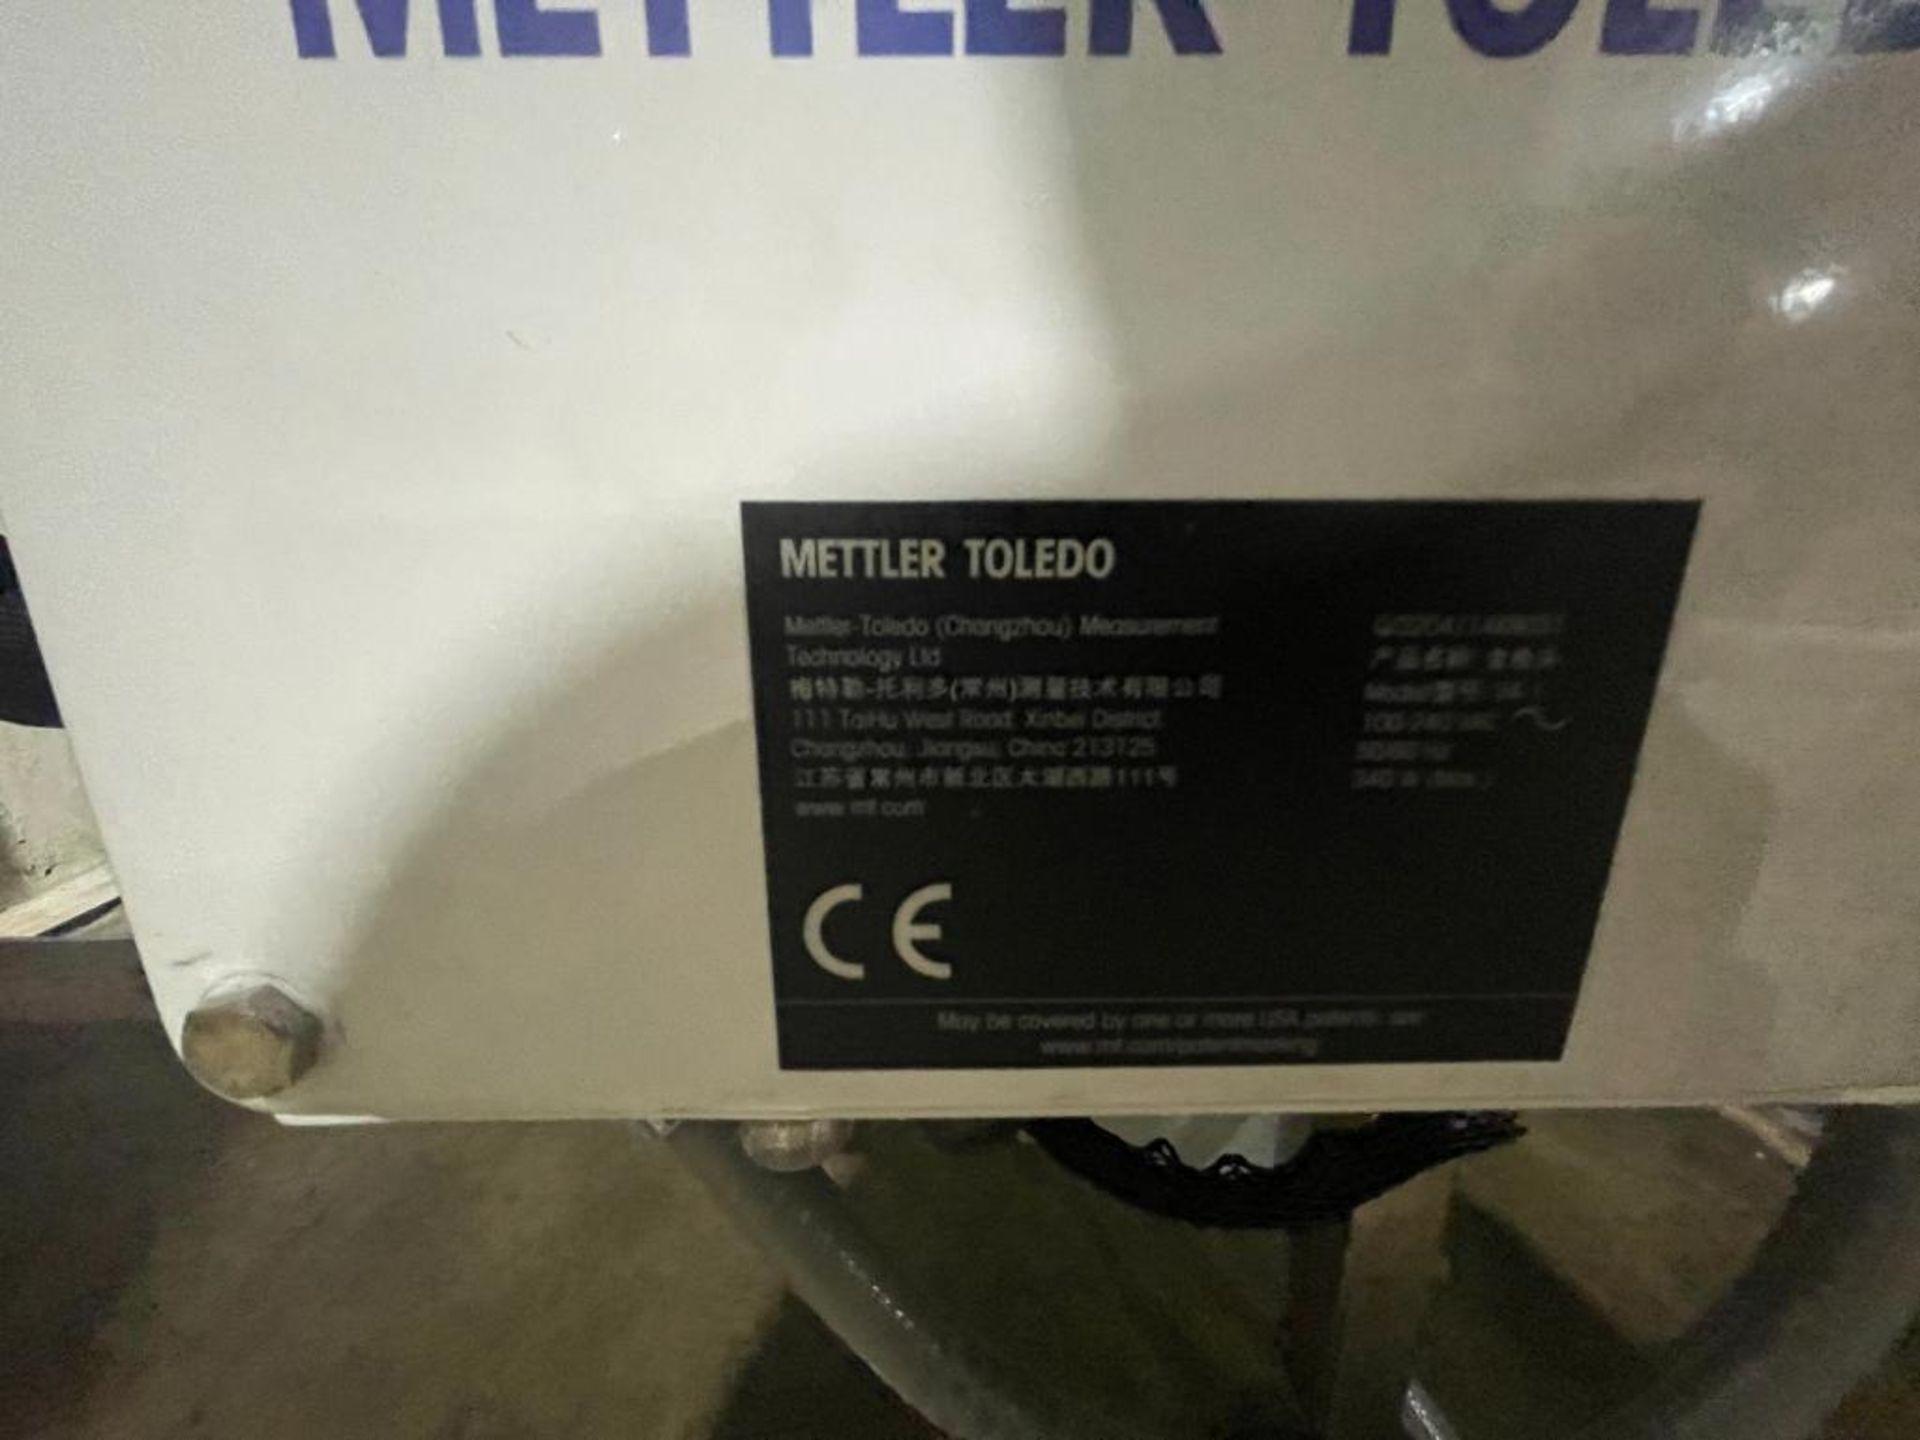 Mettler Toledo metal detector, model V4-1 - Image 3 of 14